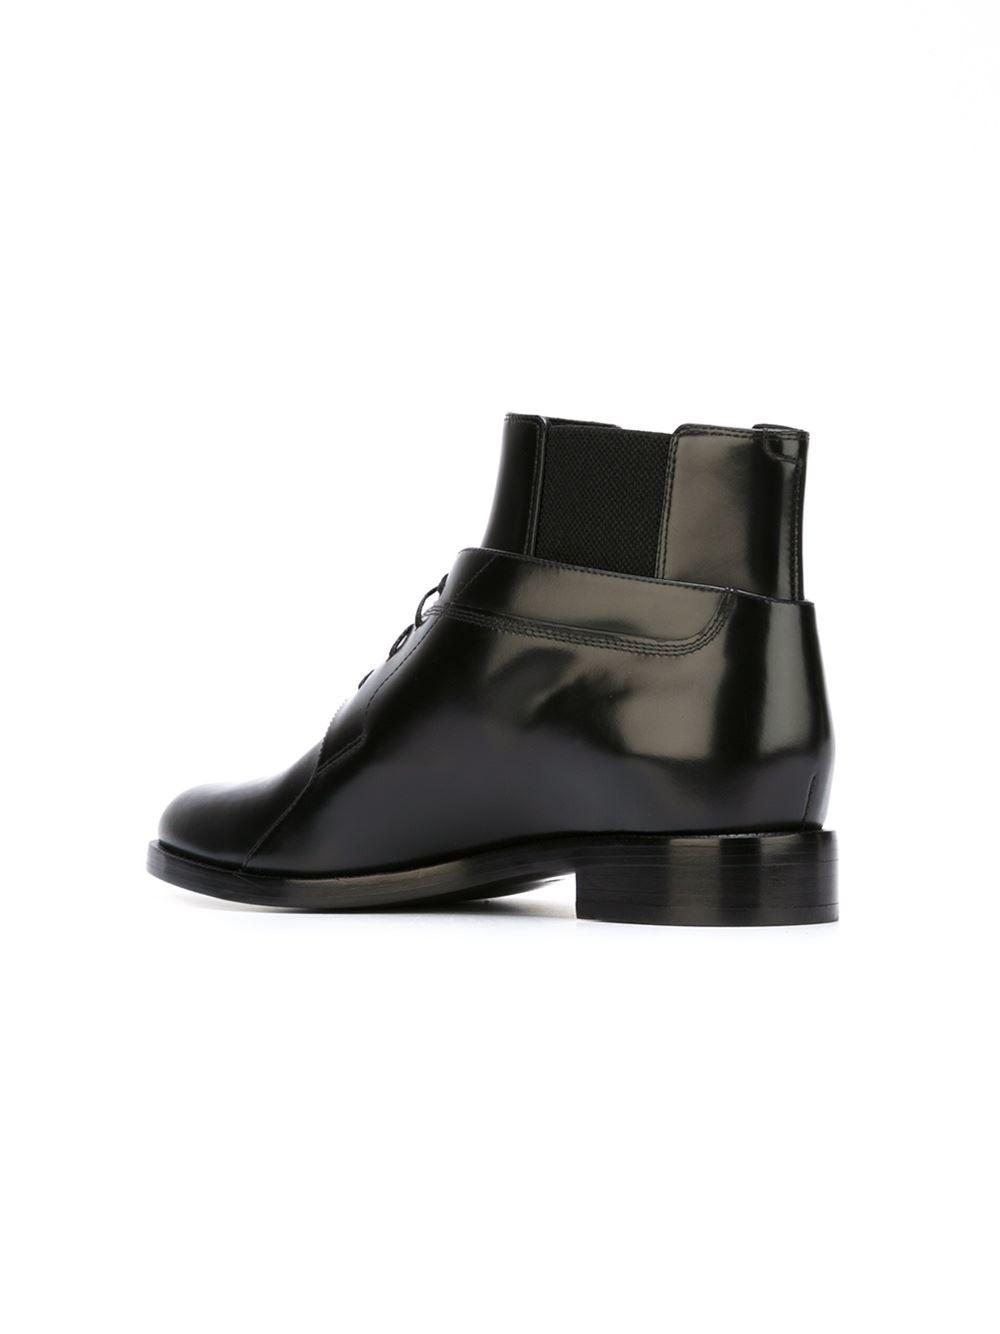 Alexander Wang Lace Up Boots gfWrAn